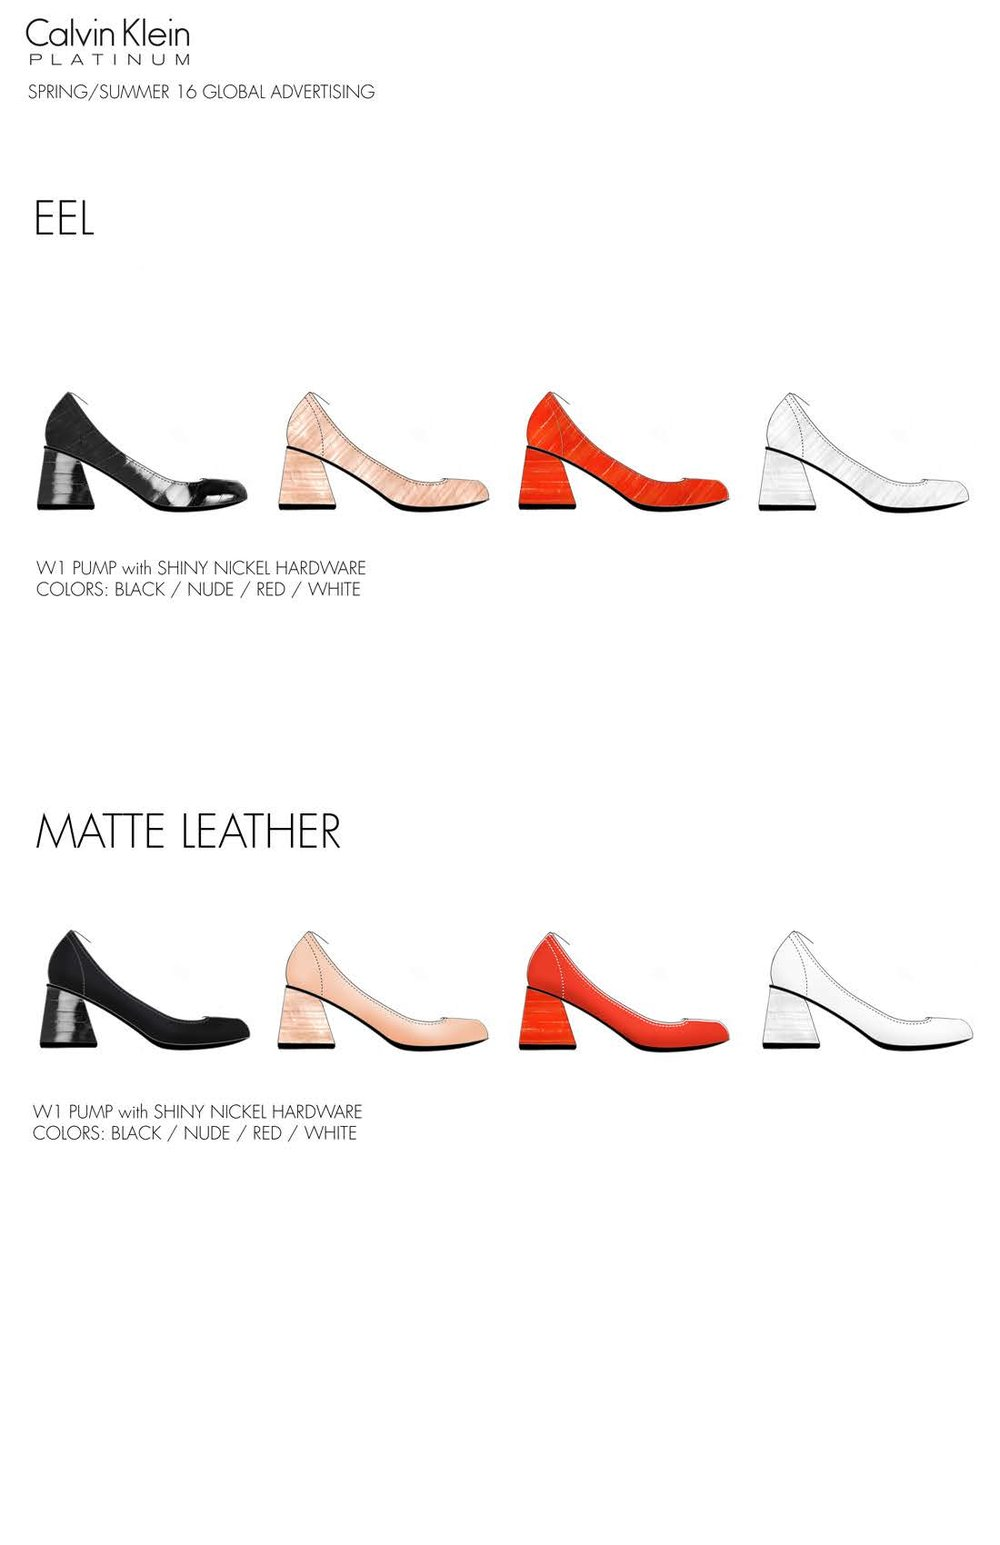 7.KGRESS Portfolio-SS16 CKP AD Footwear_Page_13.jpg